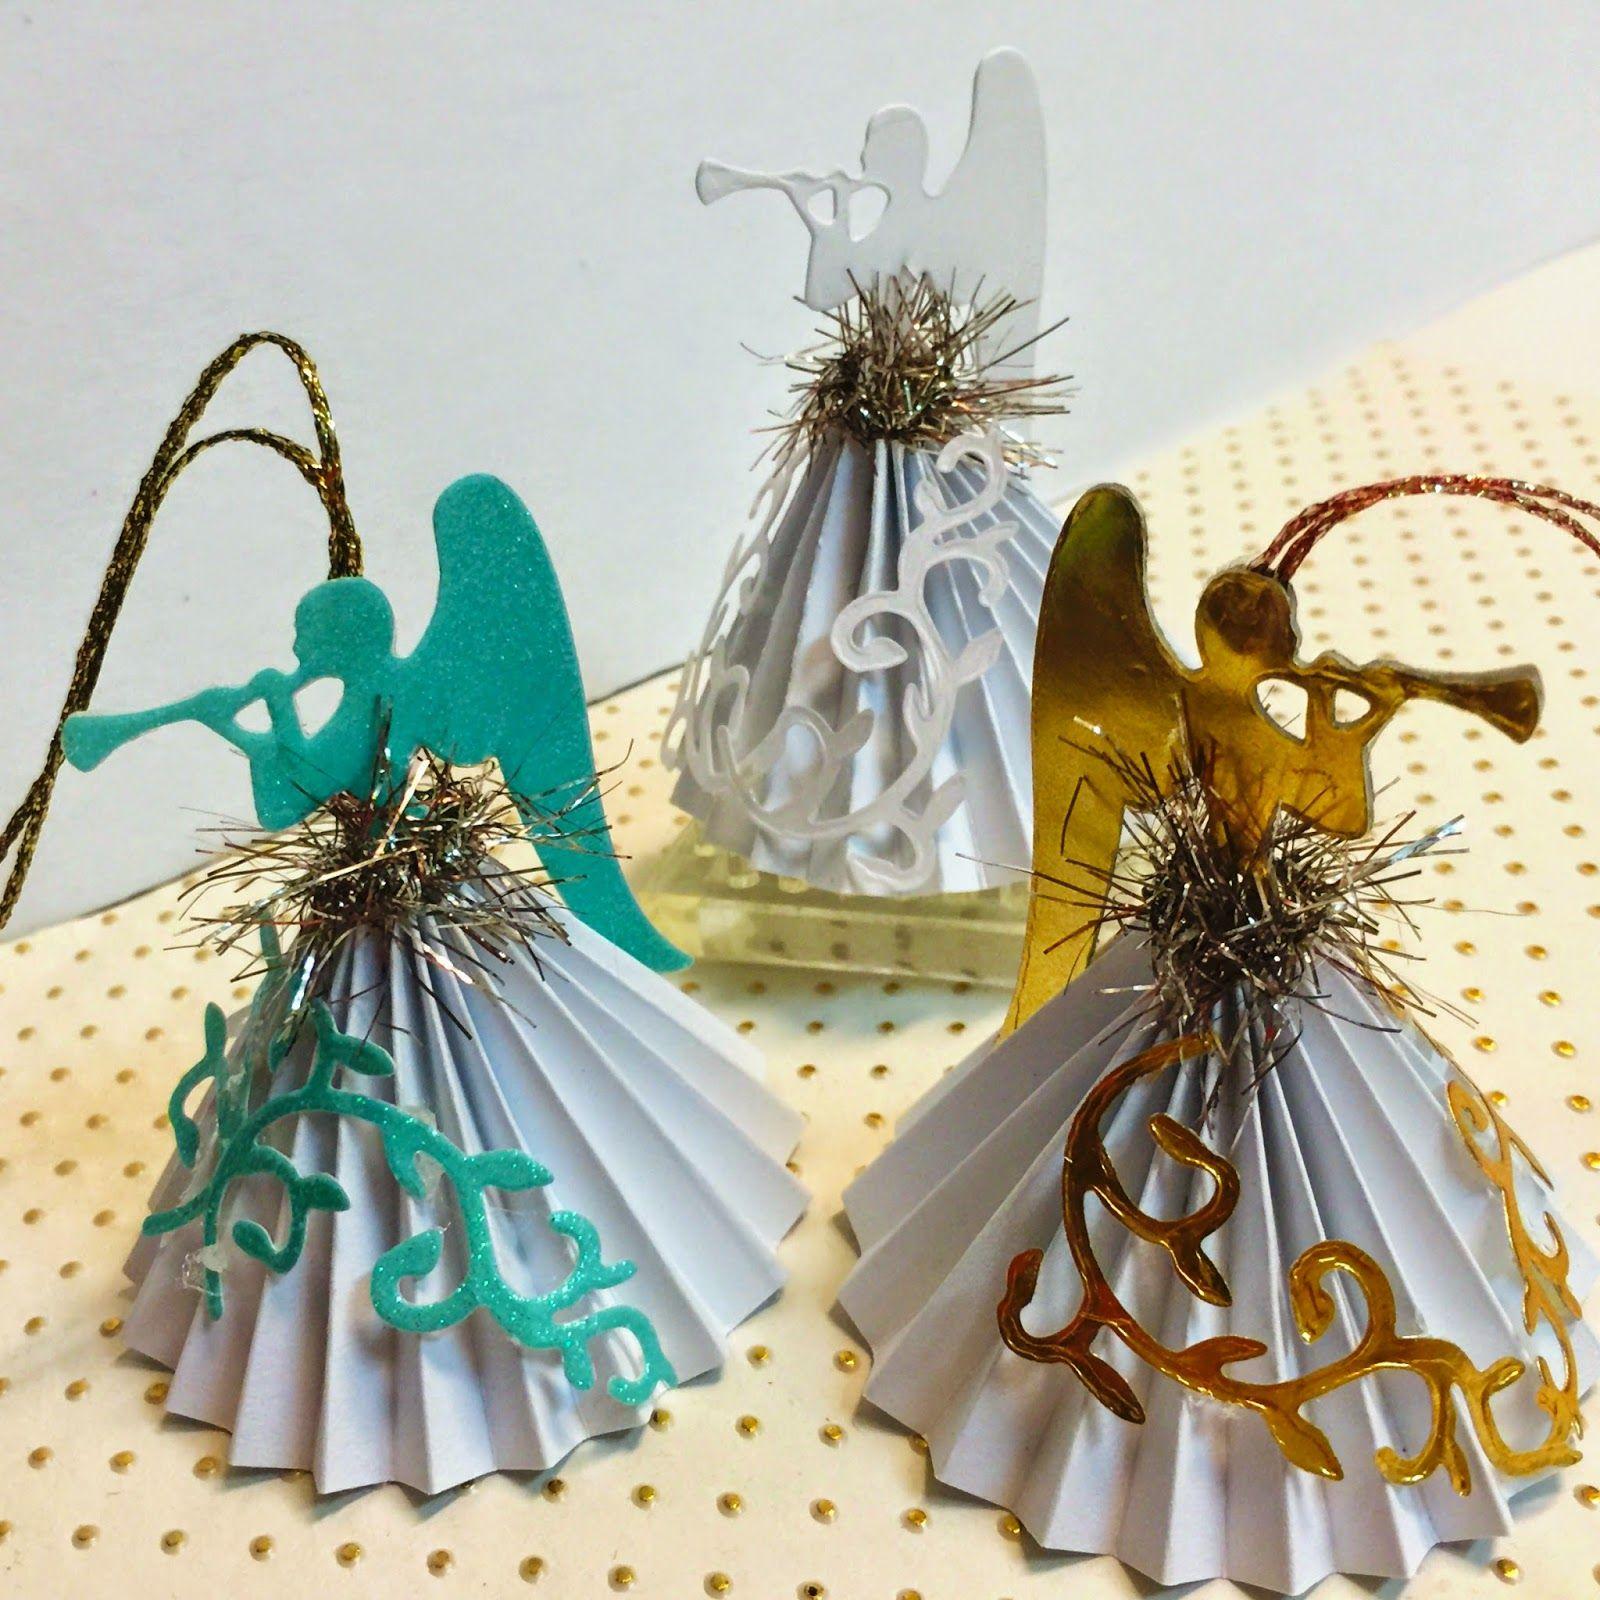 Angel Decorations To Make: Everlastingink.blogspot.com